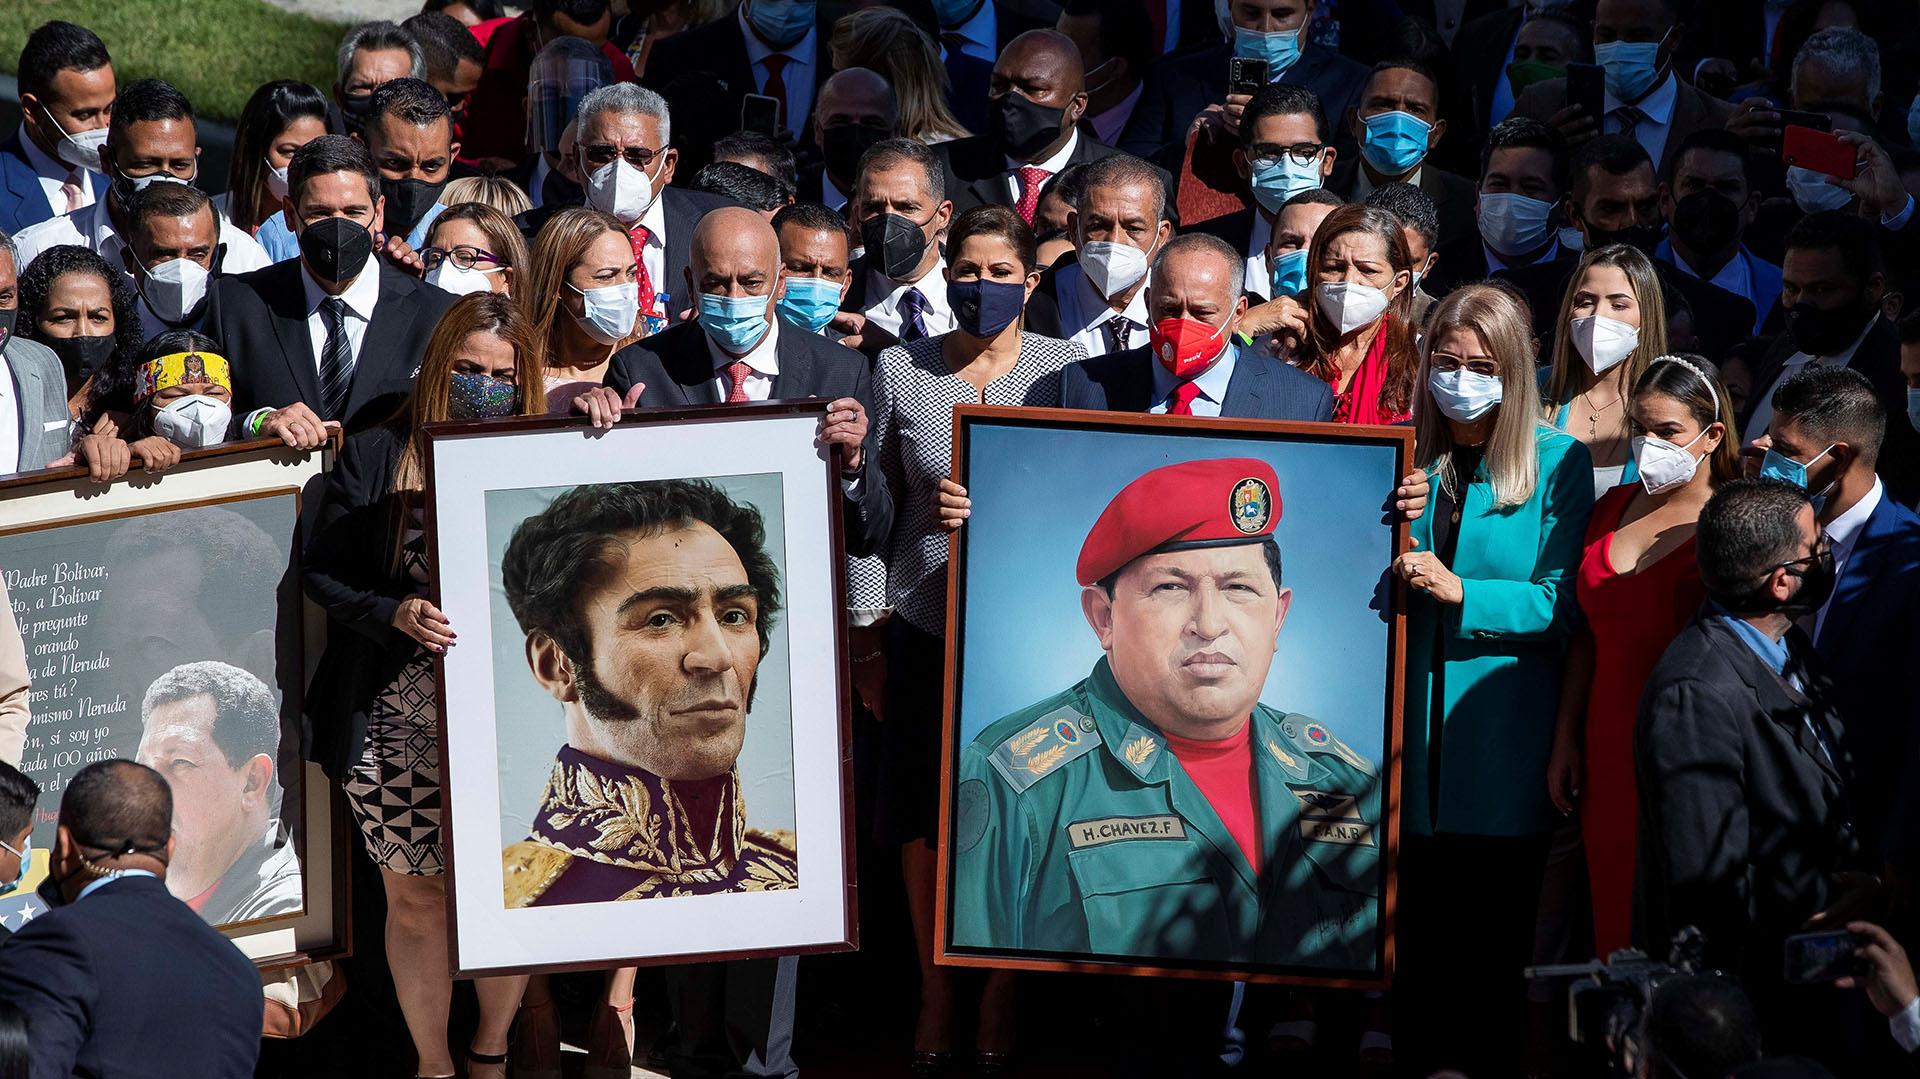 El régimen chavista anunció que Jorge Rodríguez será el próximo presidente de la Asamblea Nacional de Venezuela - Infobae